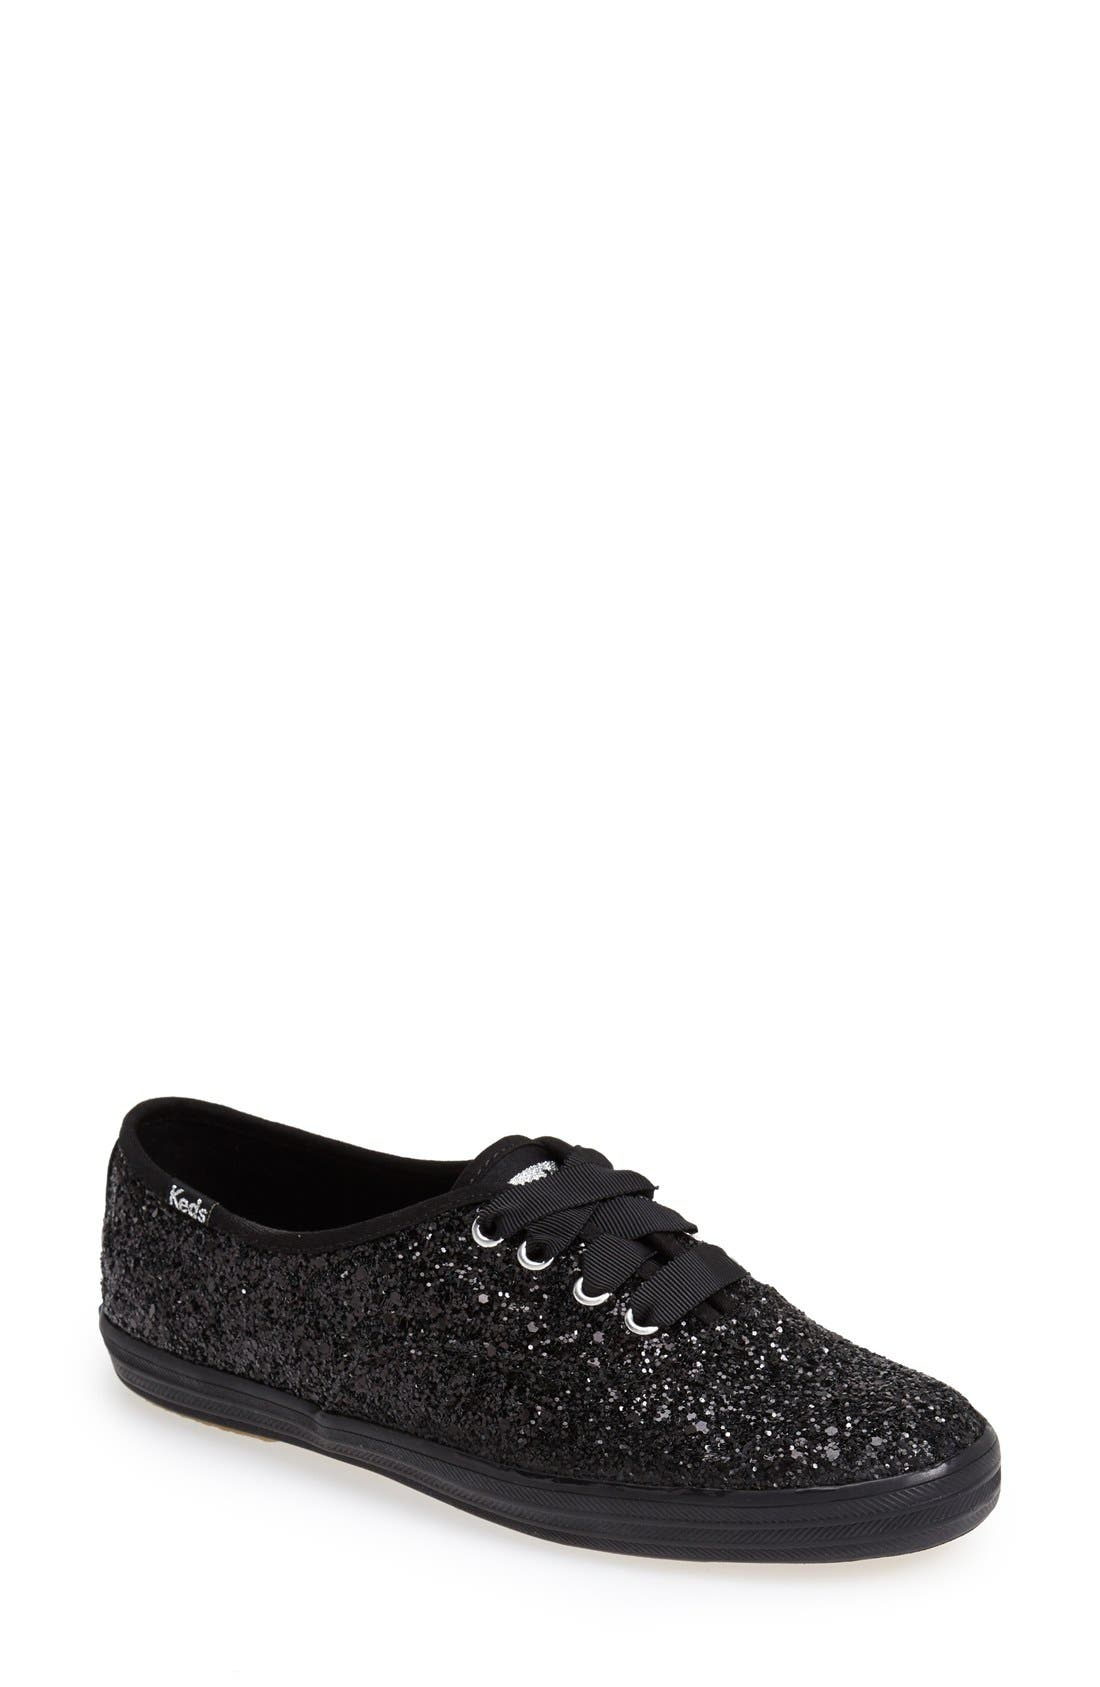 Main Image - Keds® 'Champion' Glitter Sneaker (Women)